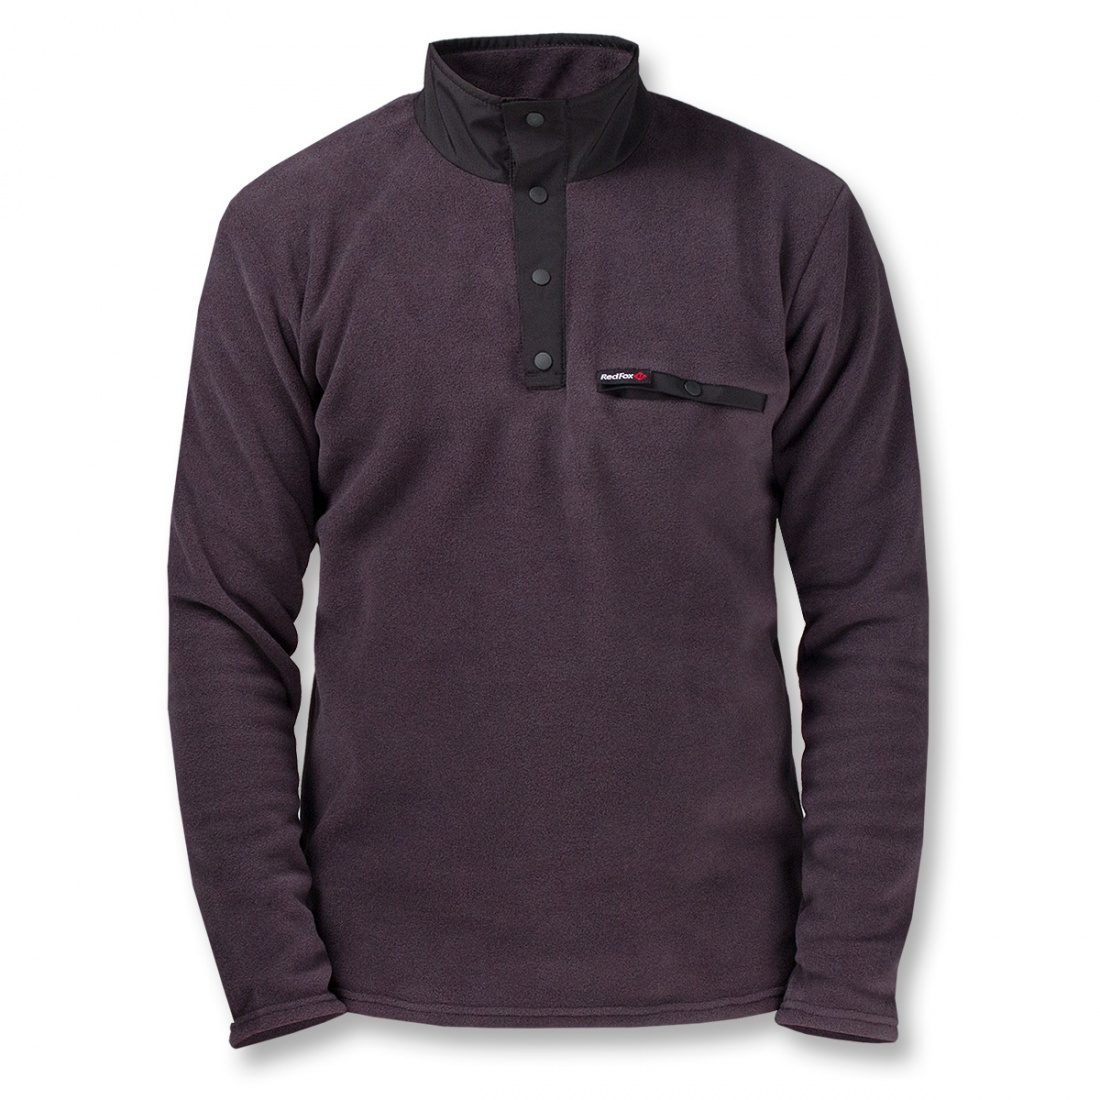 Куртка пуловер доставка